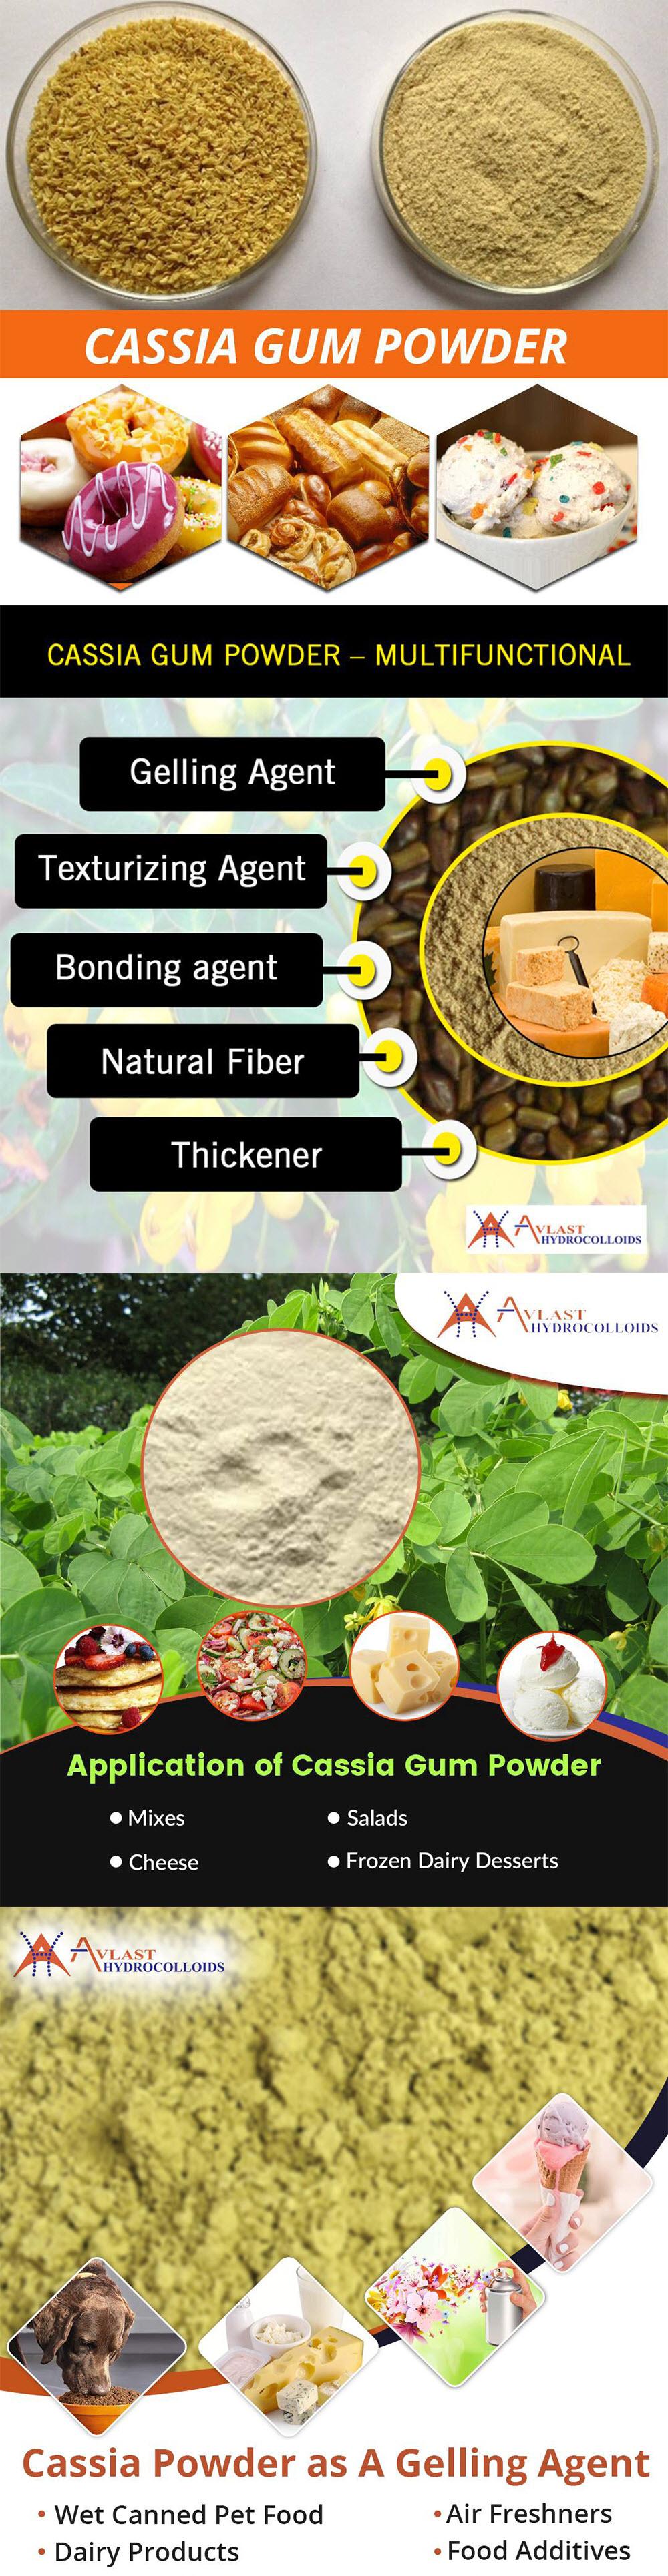 Cassia Gum Powder's Application in Food Industries